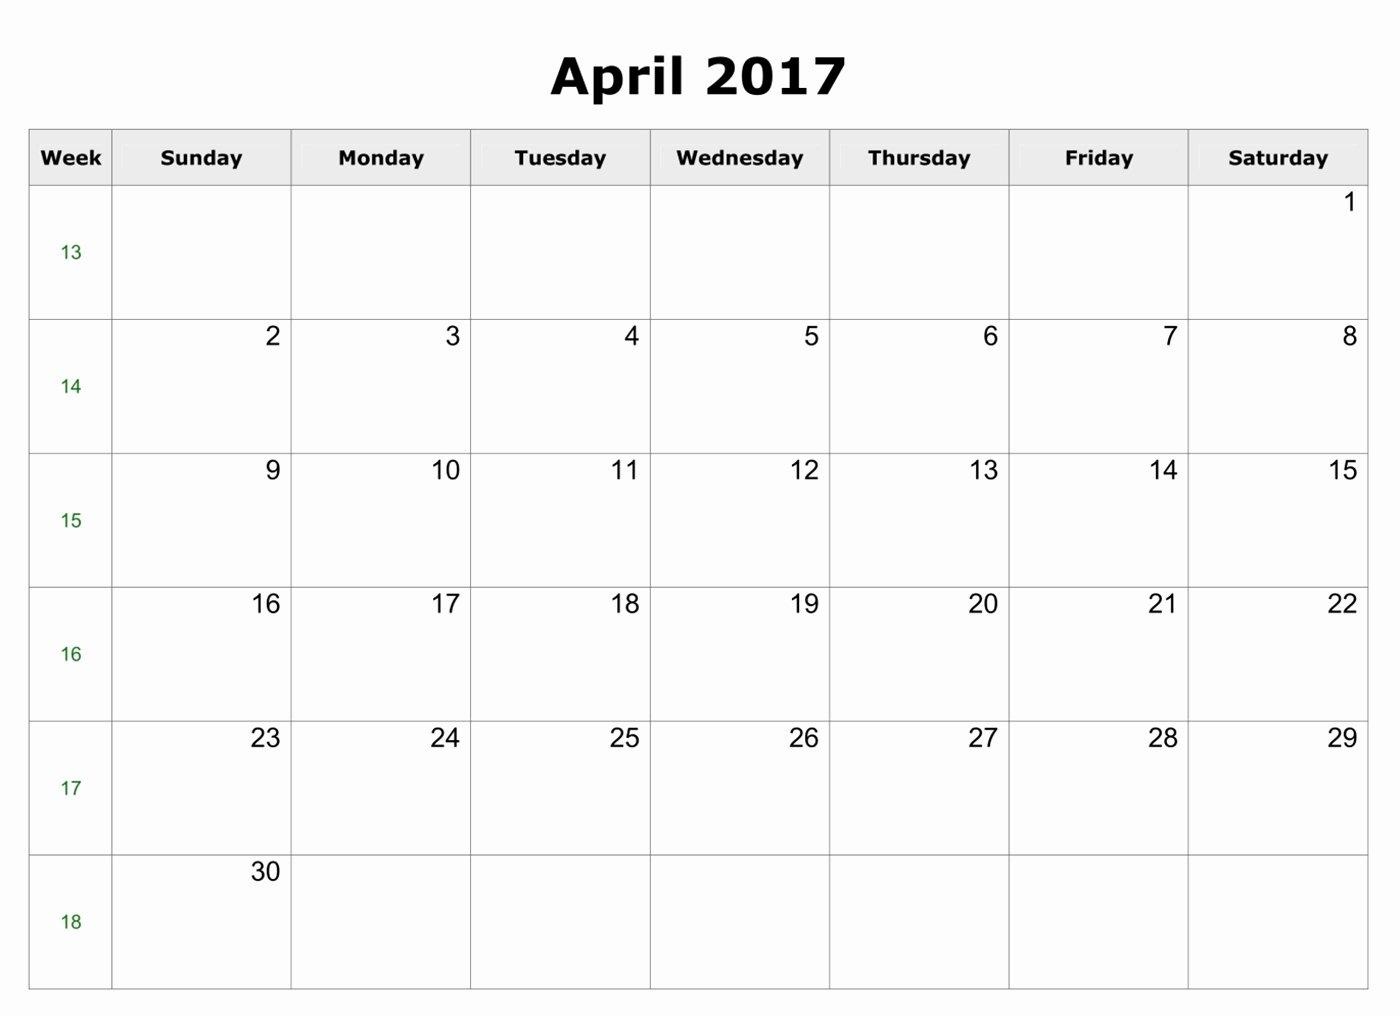 April 2017 Excel Calendar April2017 Excelcalendar